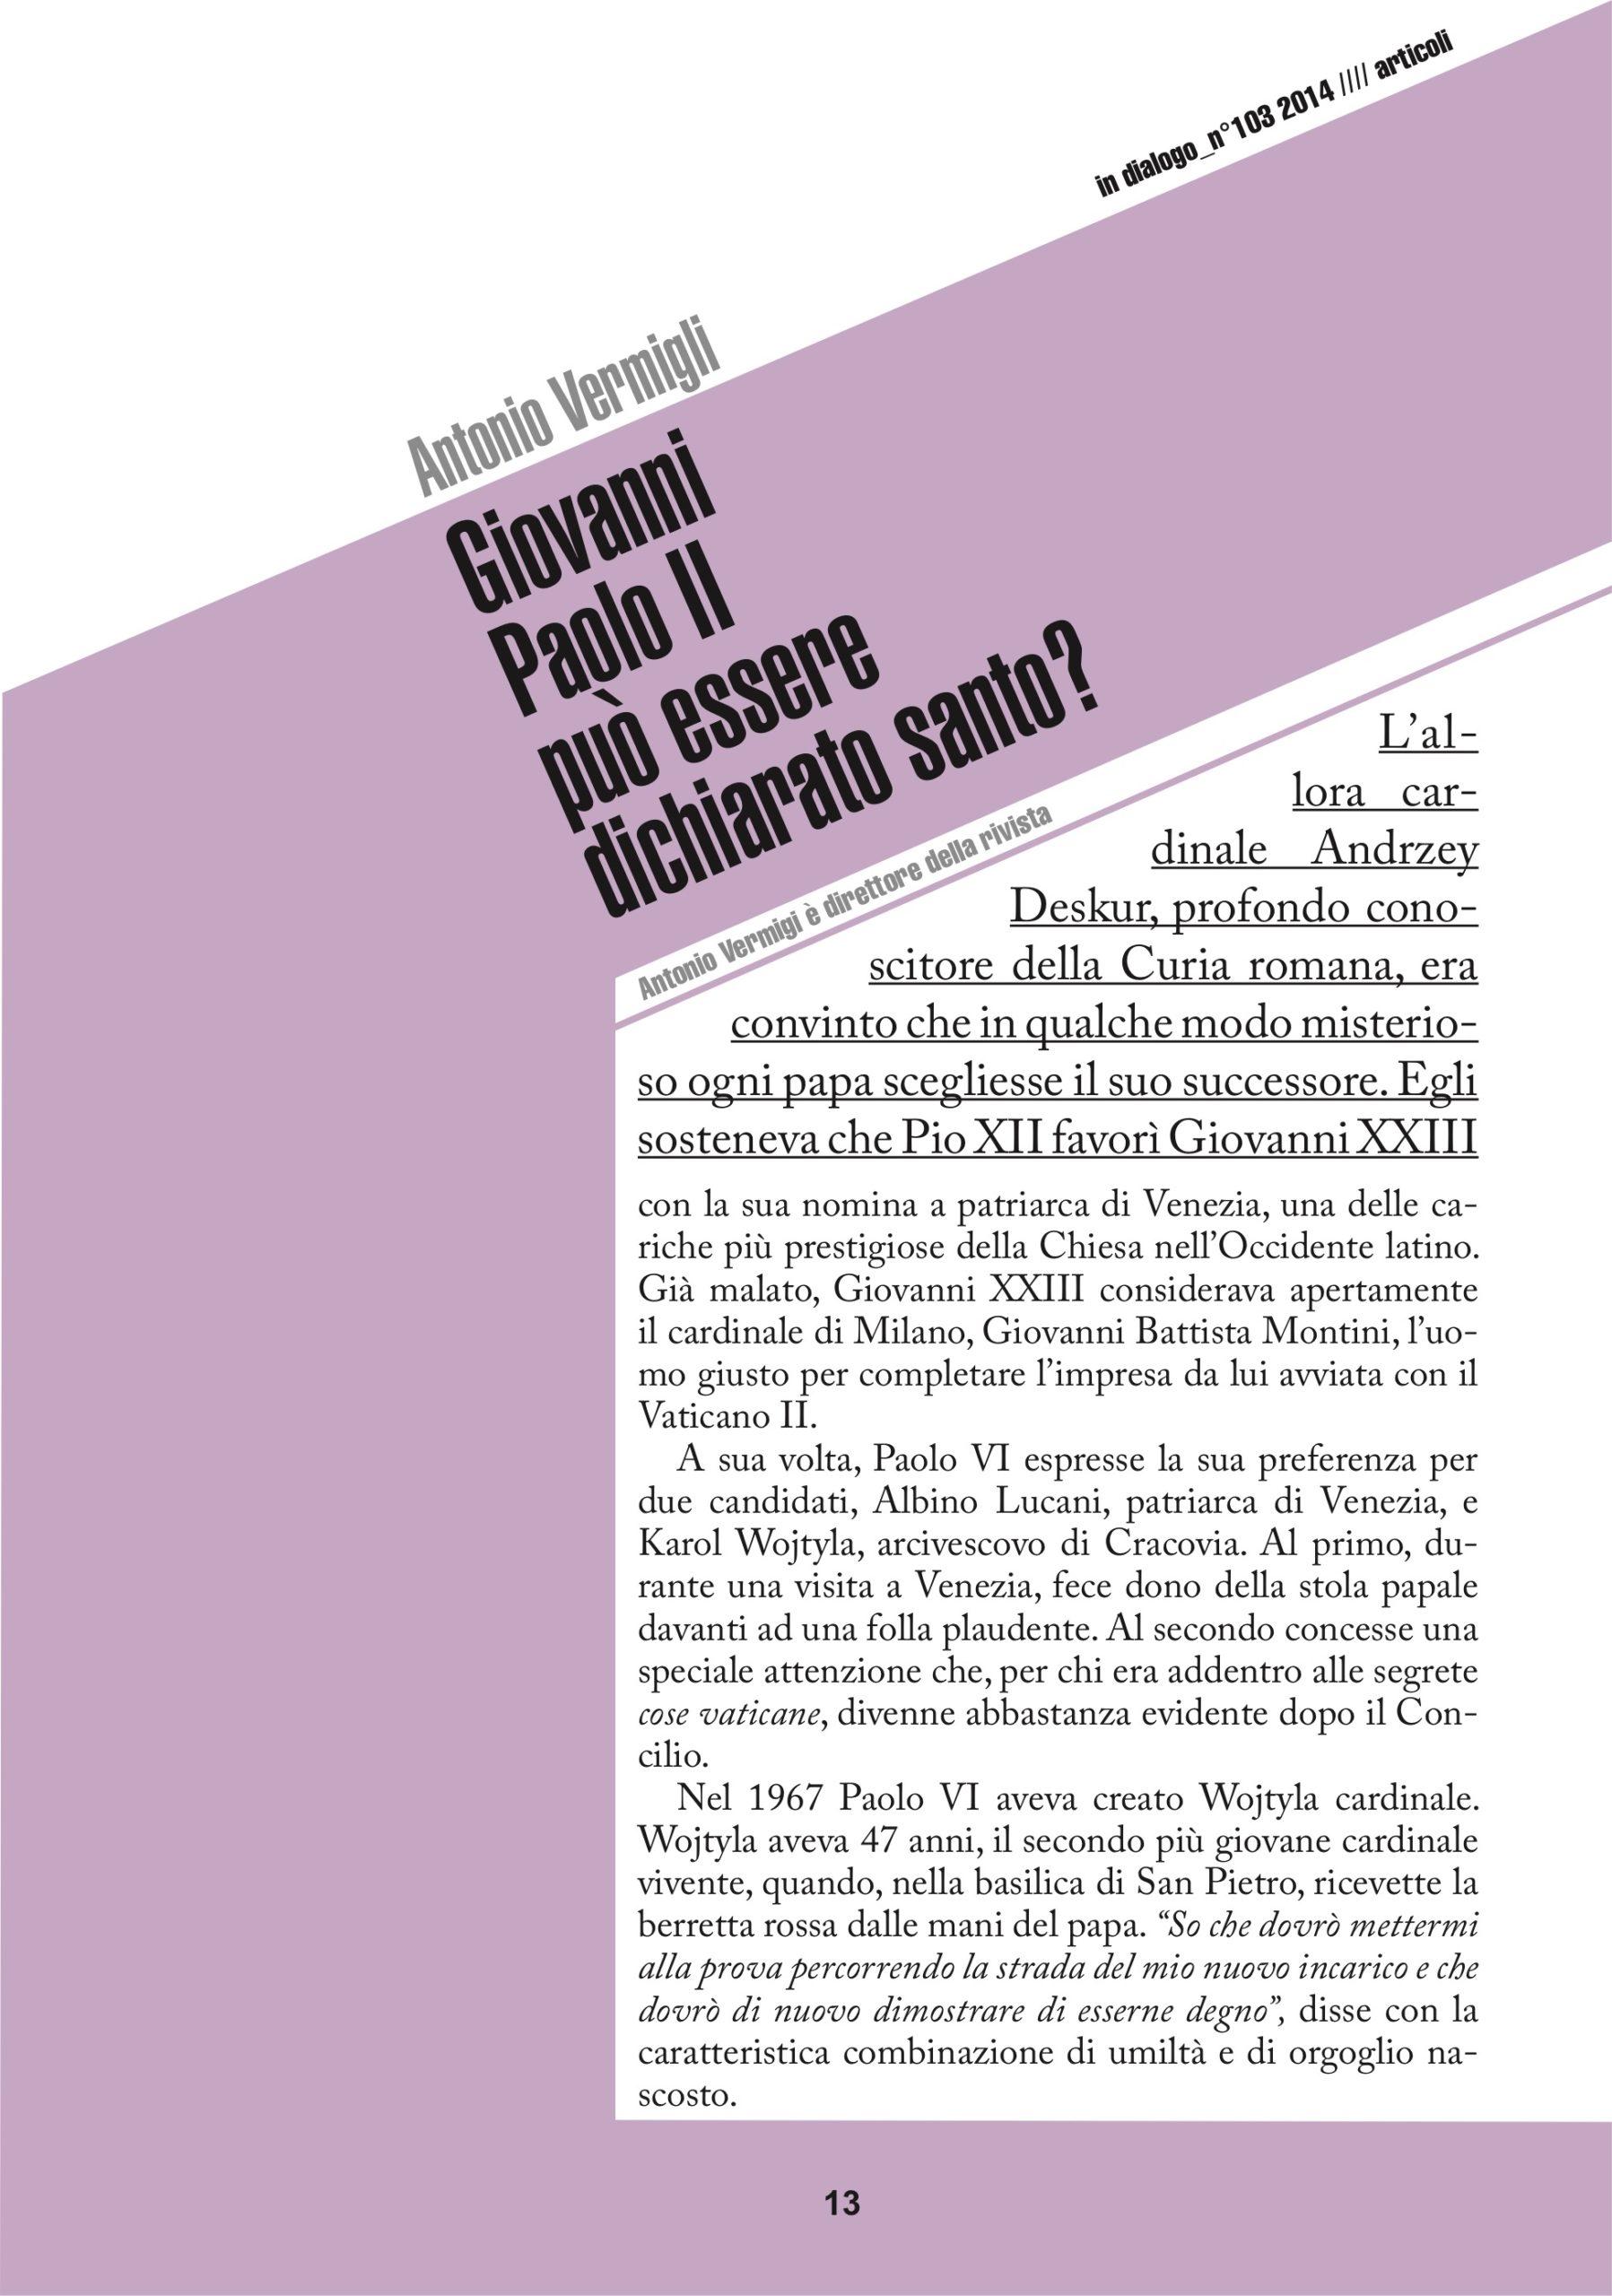 Vermigli GPII páginas 13 - 22-1